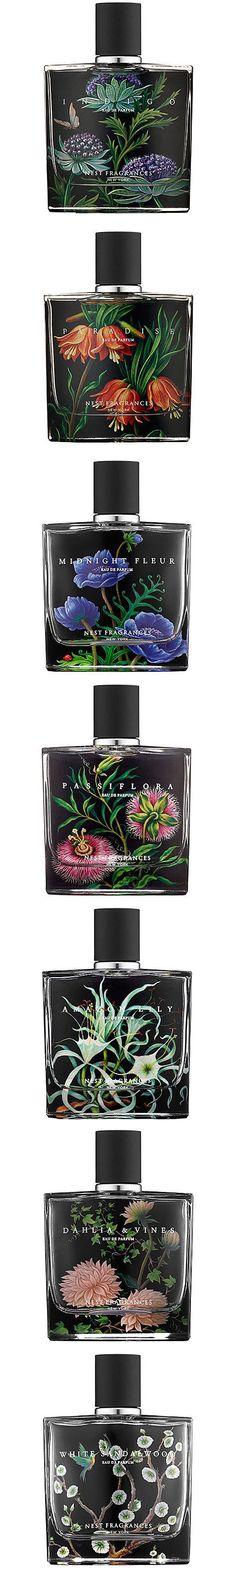 nest fragrances eau de parfum.   indigo, paradise, midnight fleur, passiflora, amazon lily, dahlia & vines, white sandalwood.